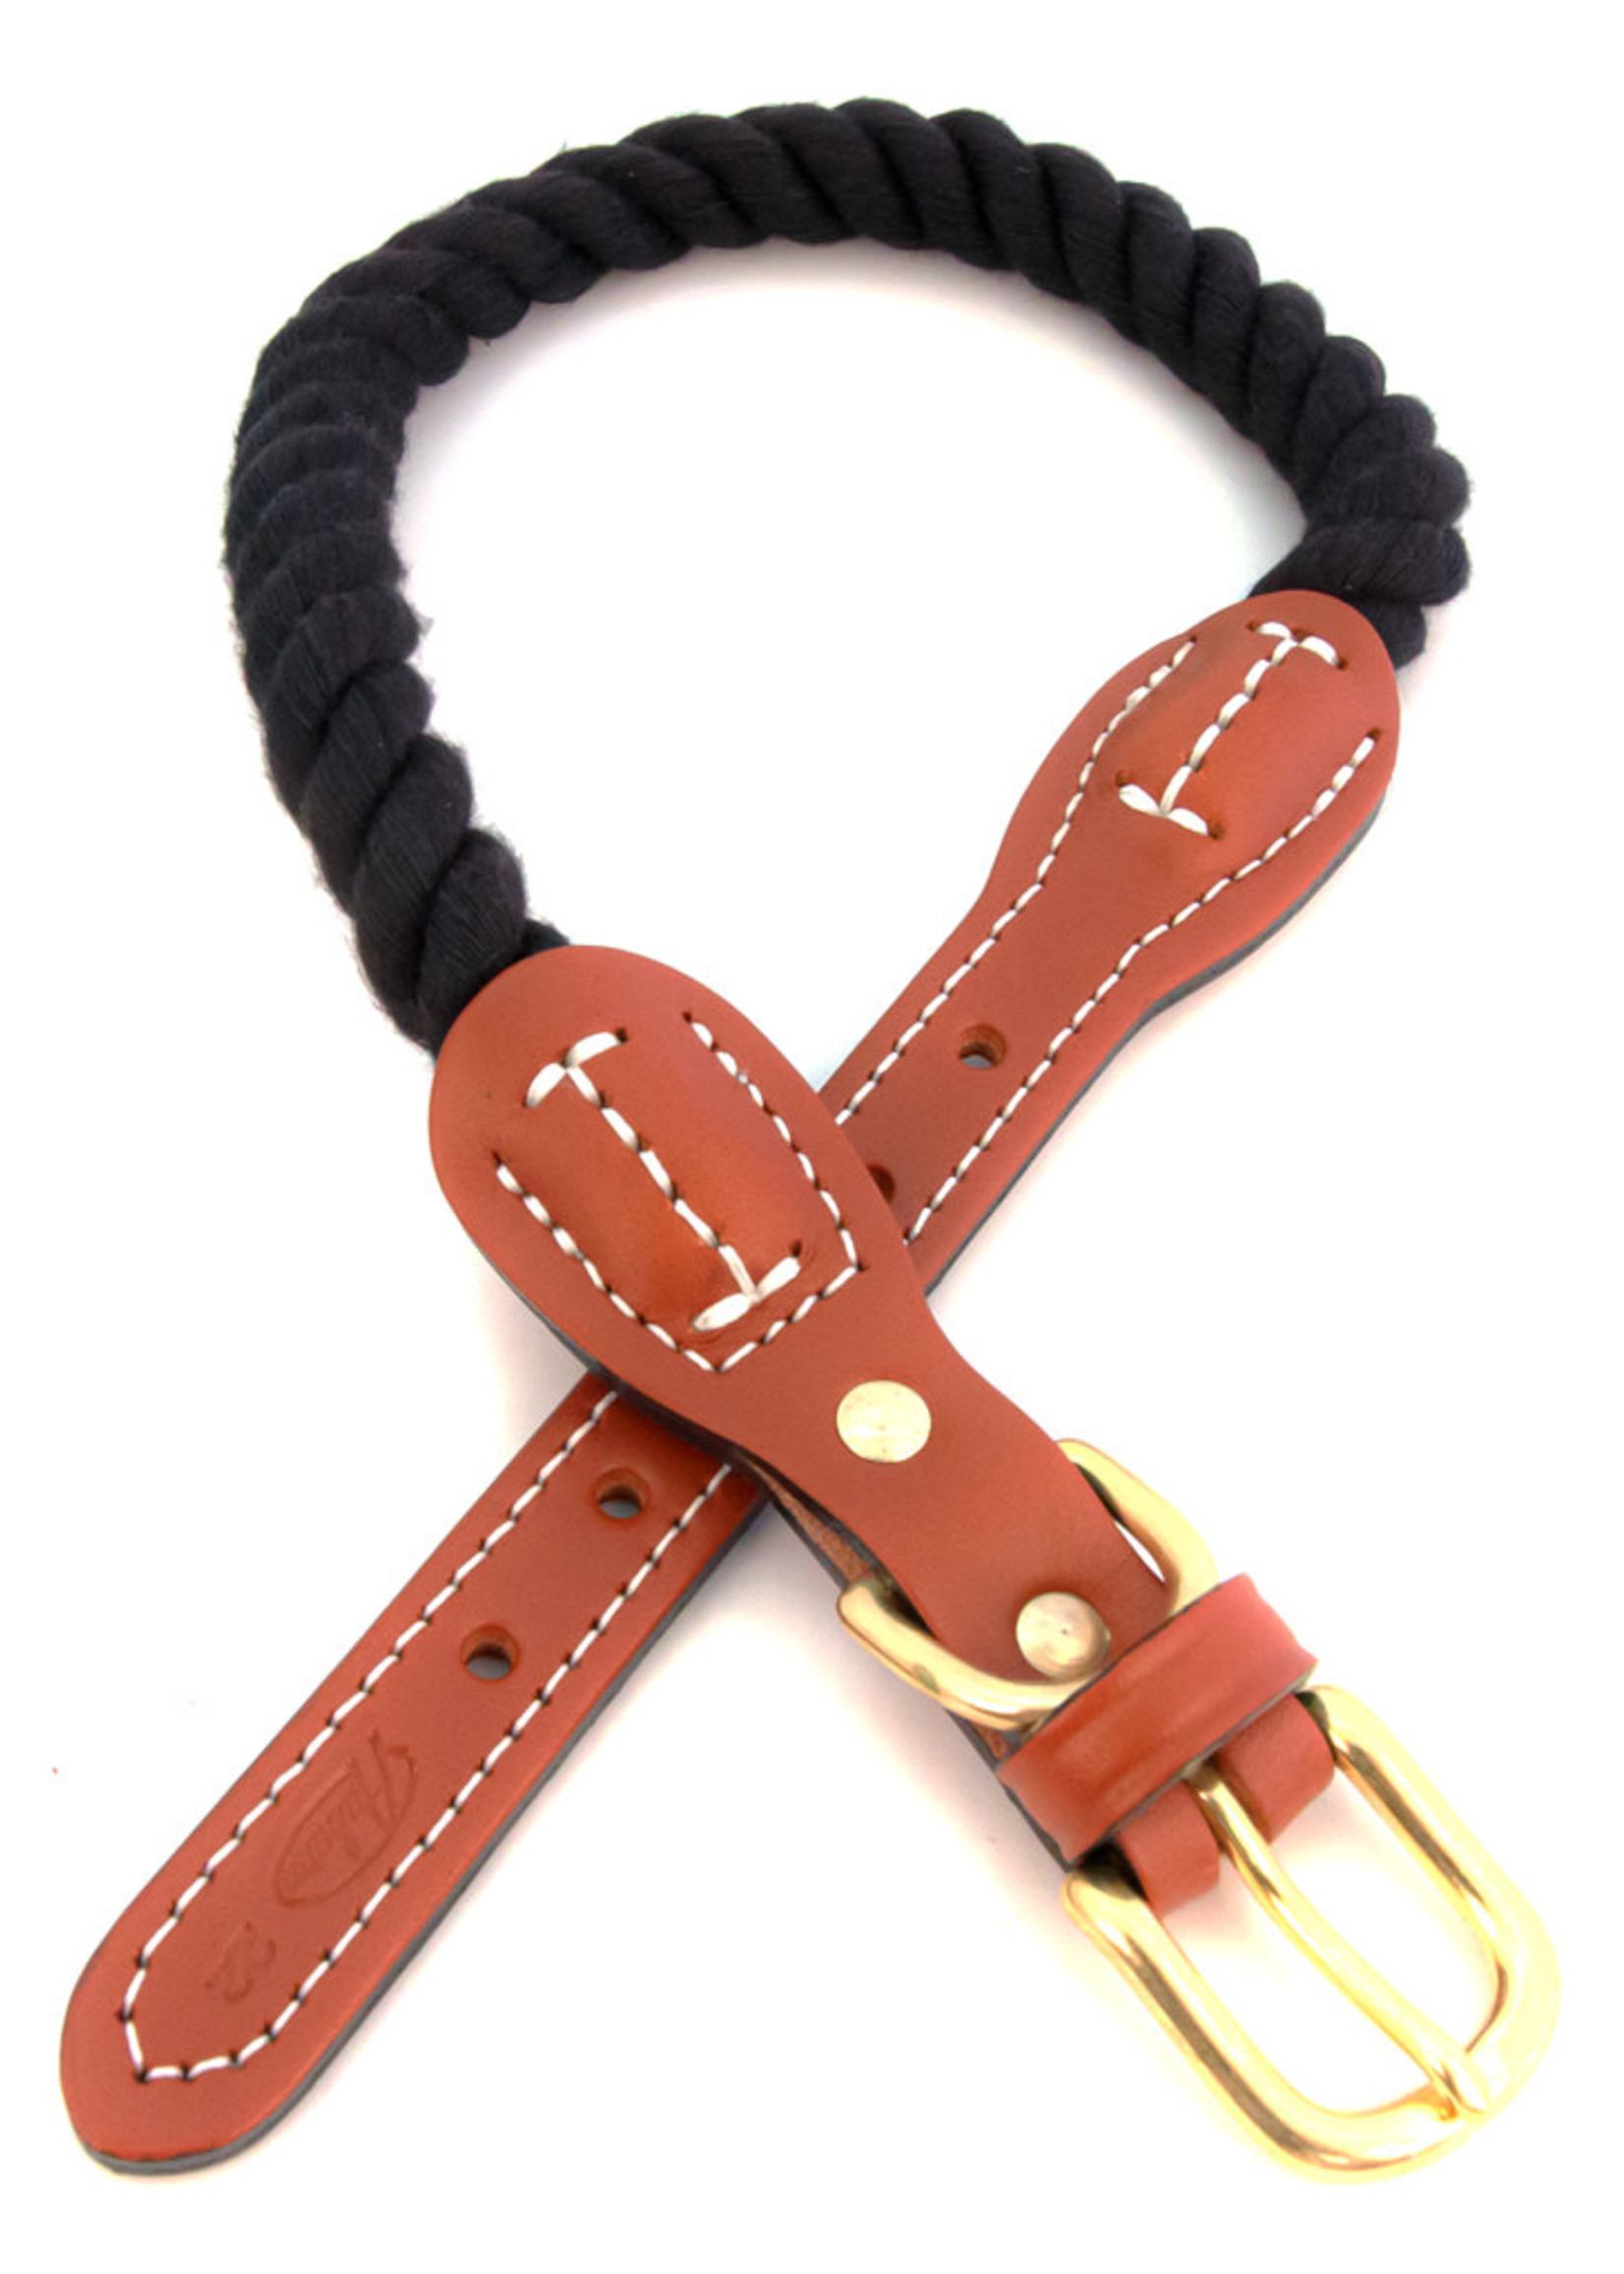 "Auburn Leathercrafters Auburn Leather Black Cotton/Leather Collar 3/4""x16"""